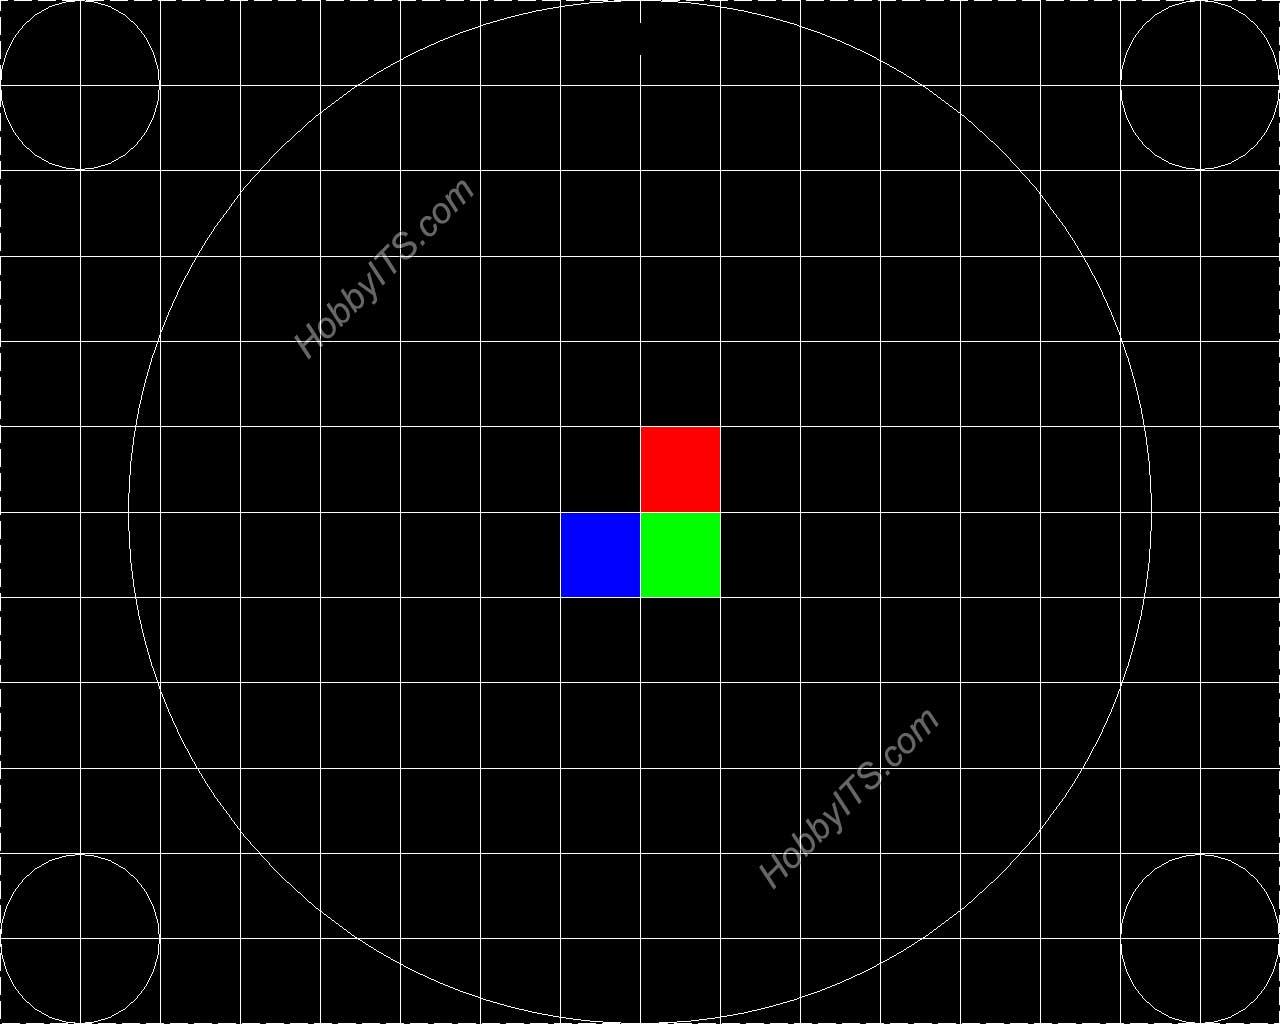 Тест геометрии монитора